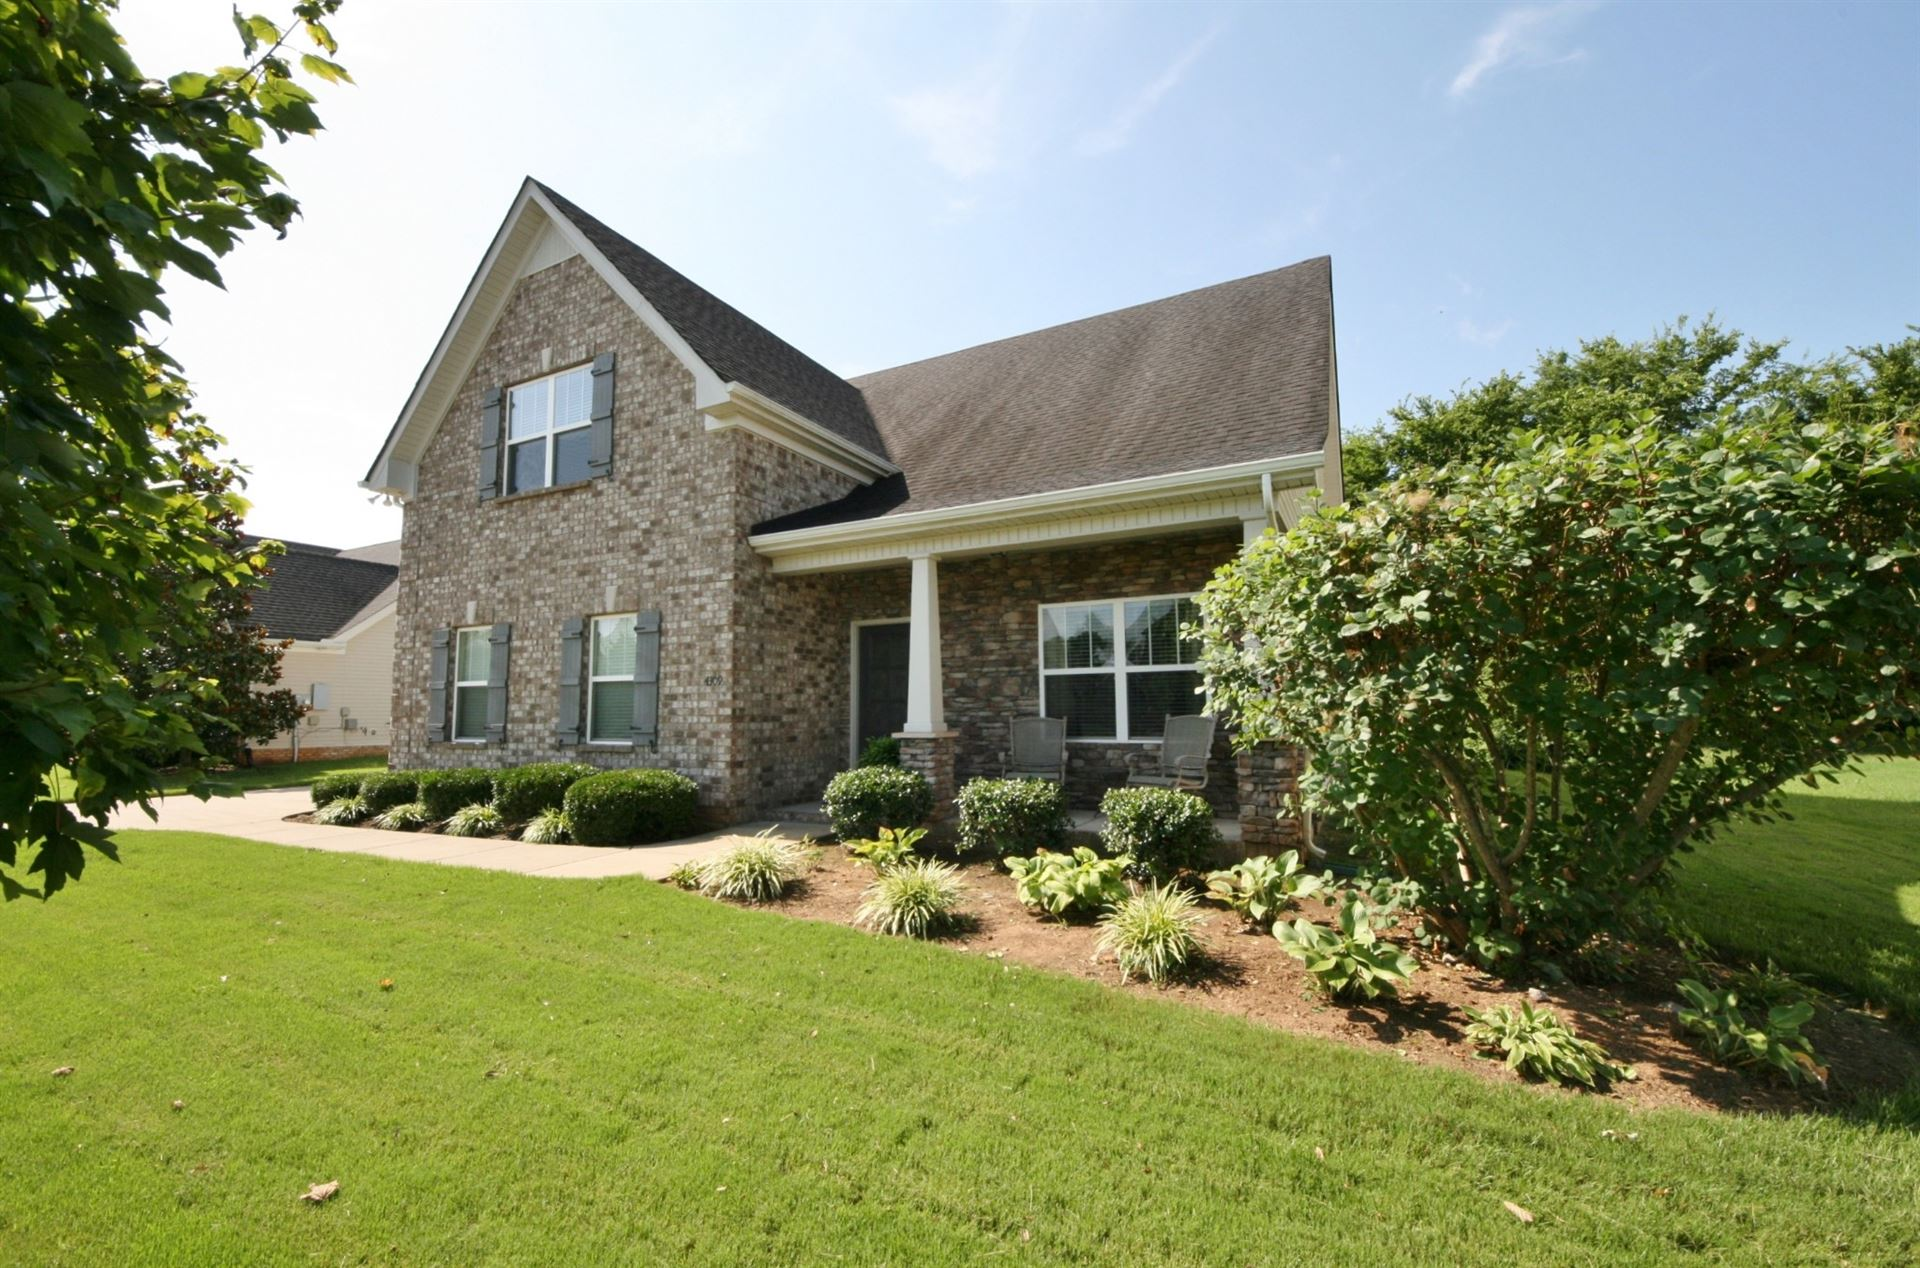 4309 Roxburghe Ct, Murfreesboro, TN 37128 - MLS#: 2274009